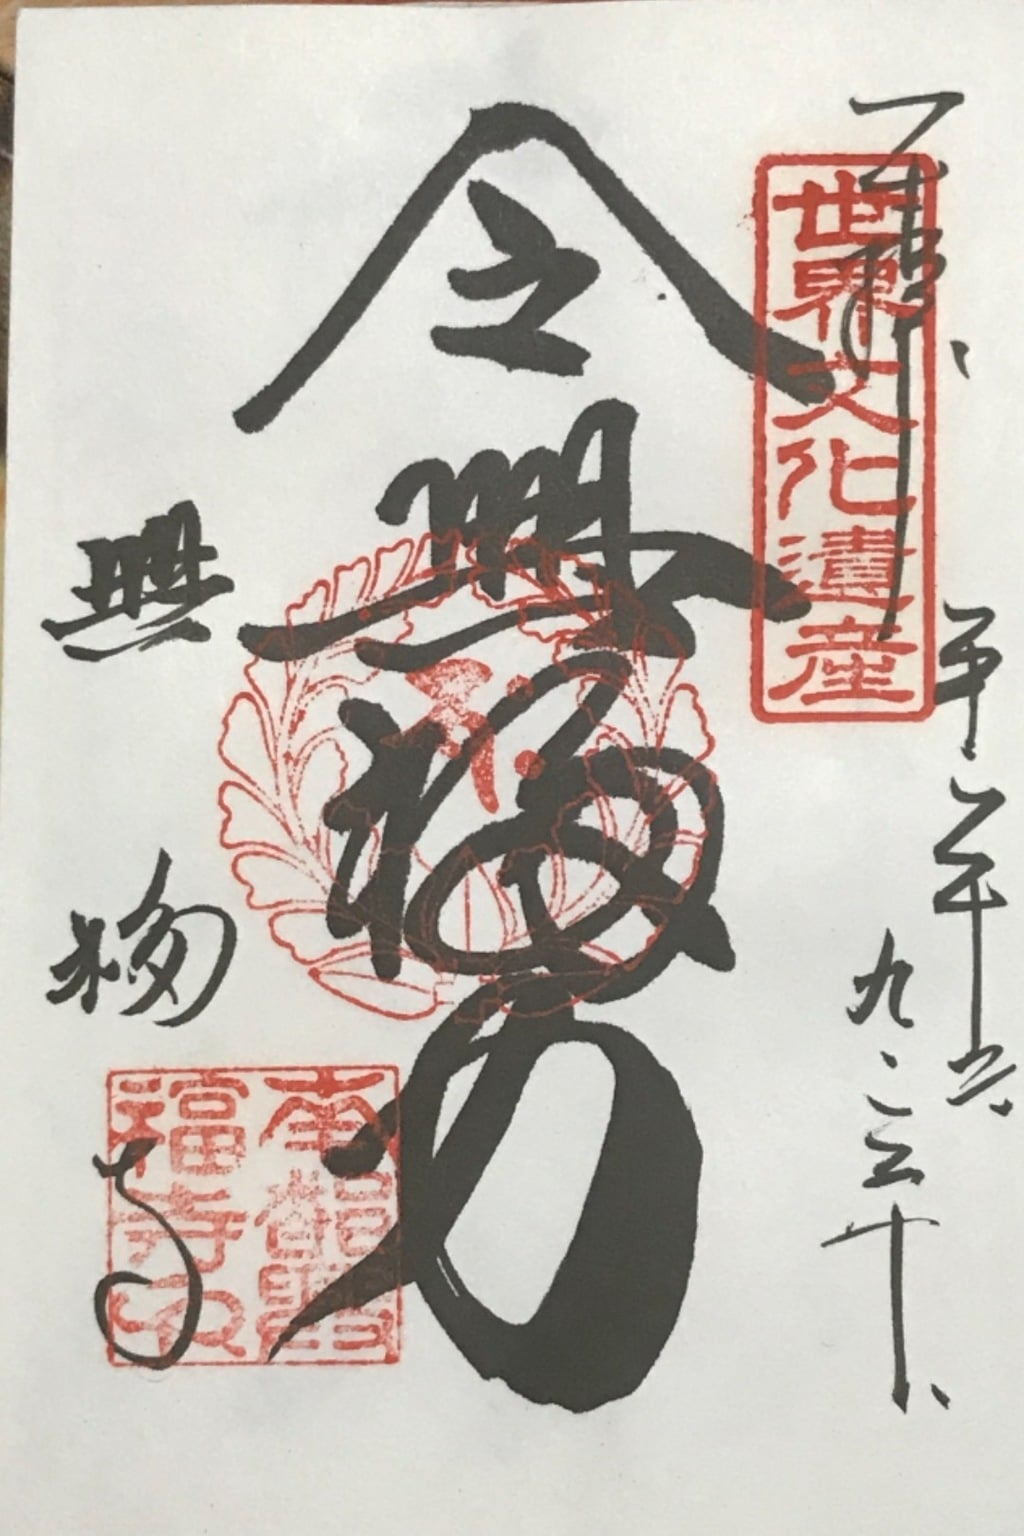 興福寺の御朱印